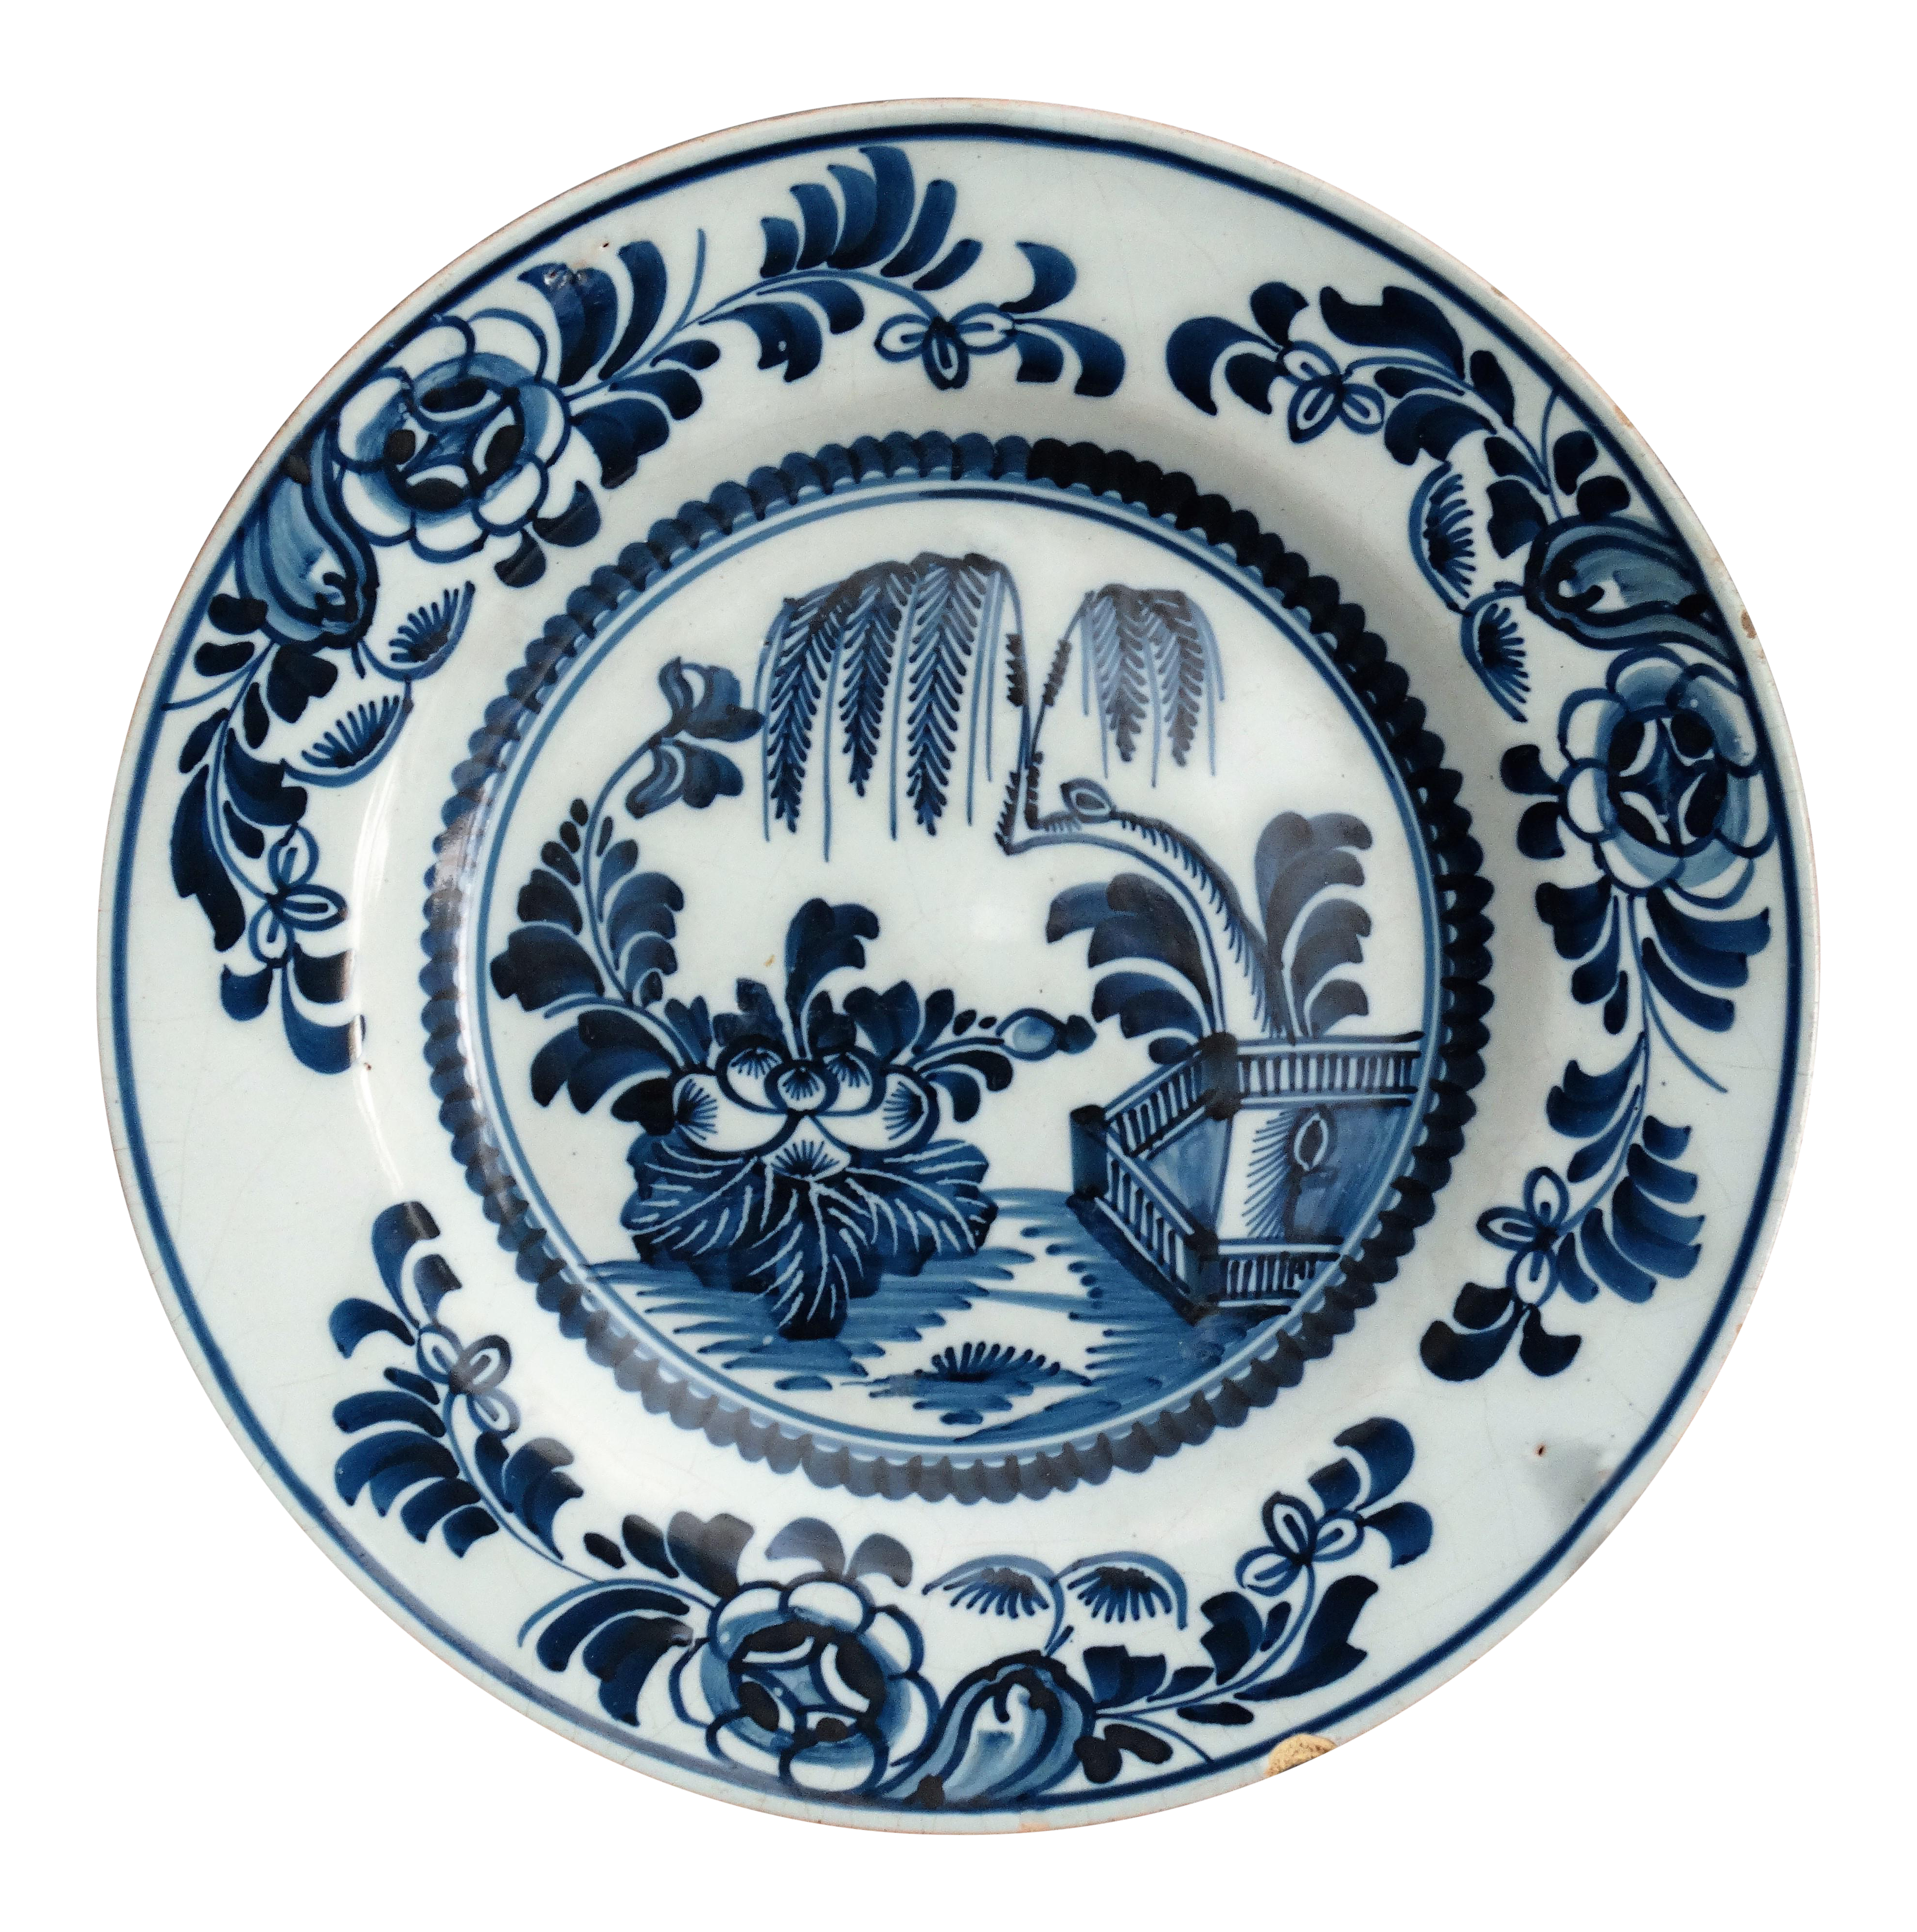 18th-Century Antique Delft Chinoiserie Plate  sc 1 st  Chairish & 18th-Century Antique Delft Chinoiserie Plate | Chairish